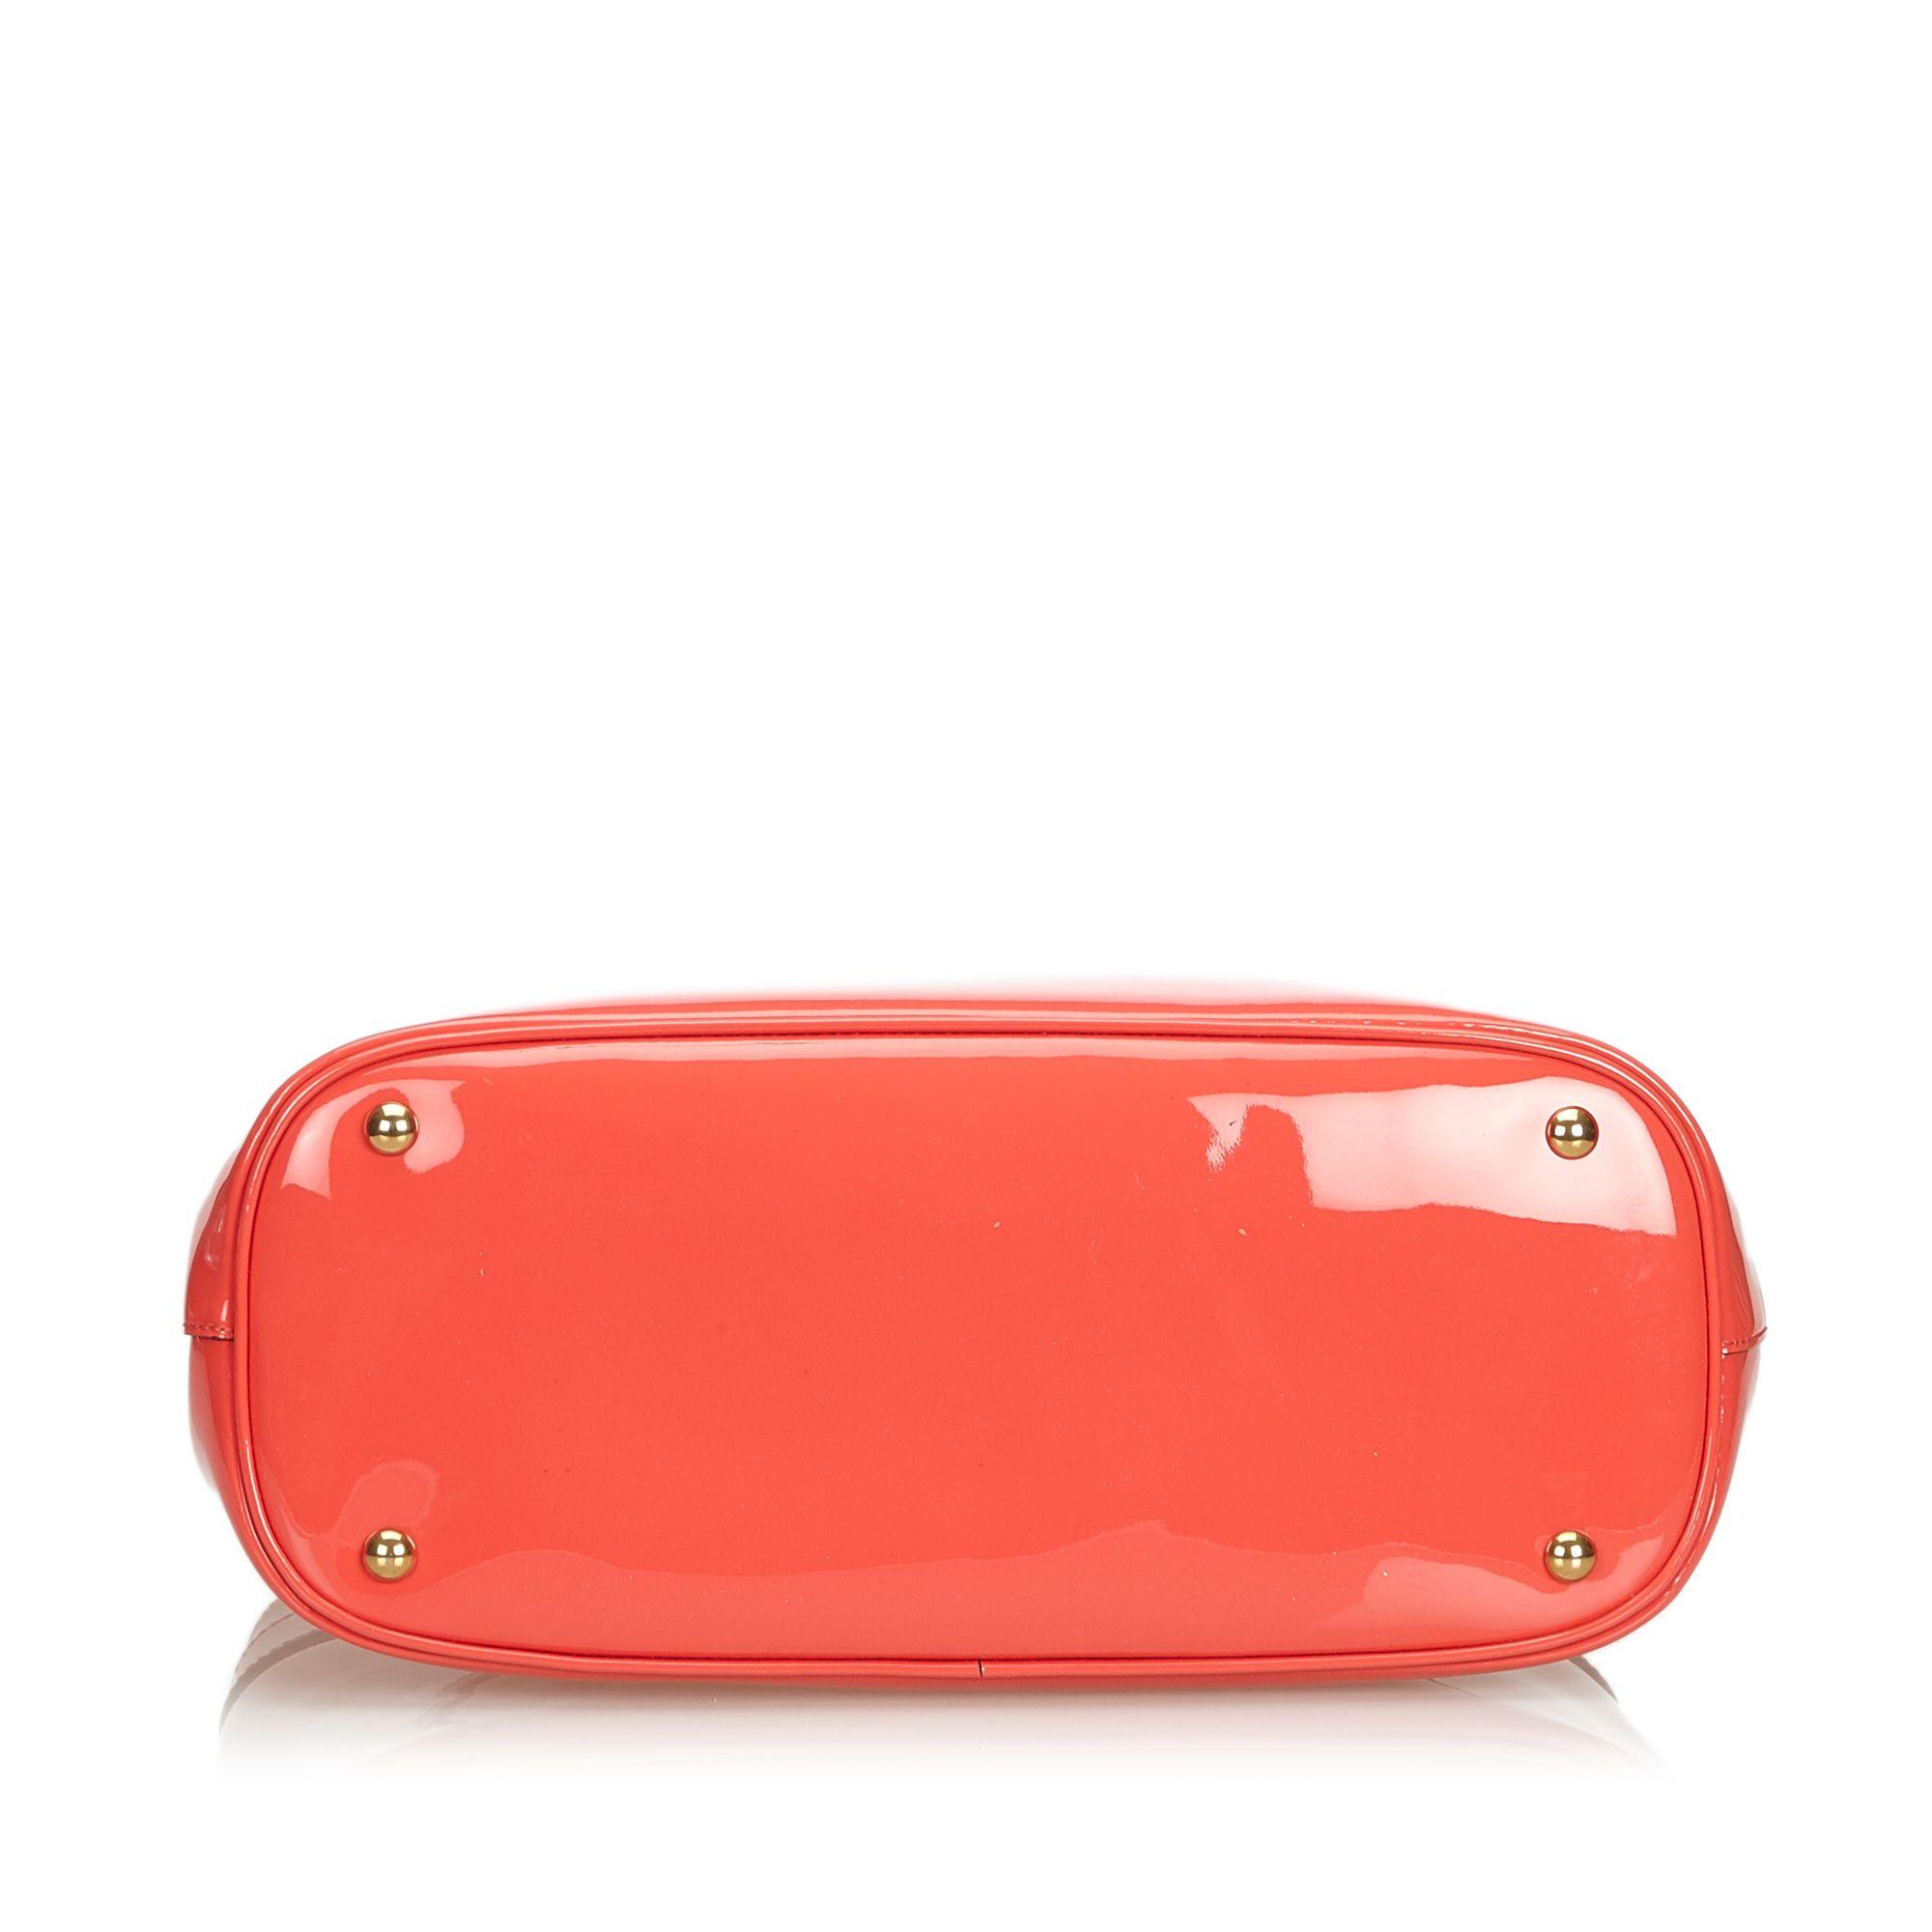 Vintage Gucci Patent Leather Bright Bit Satchel Pink